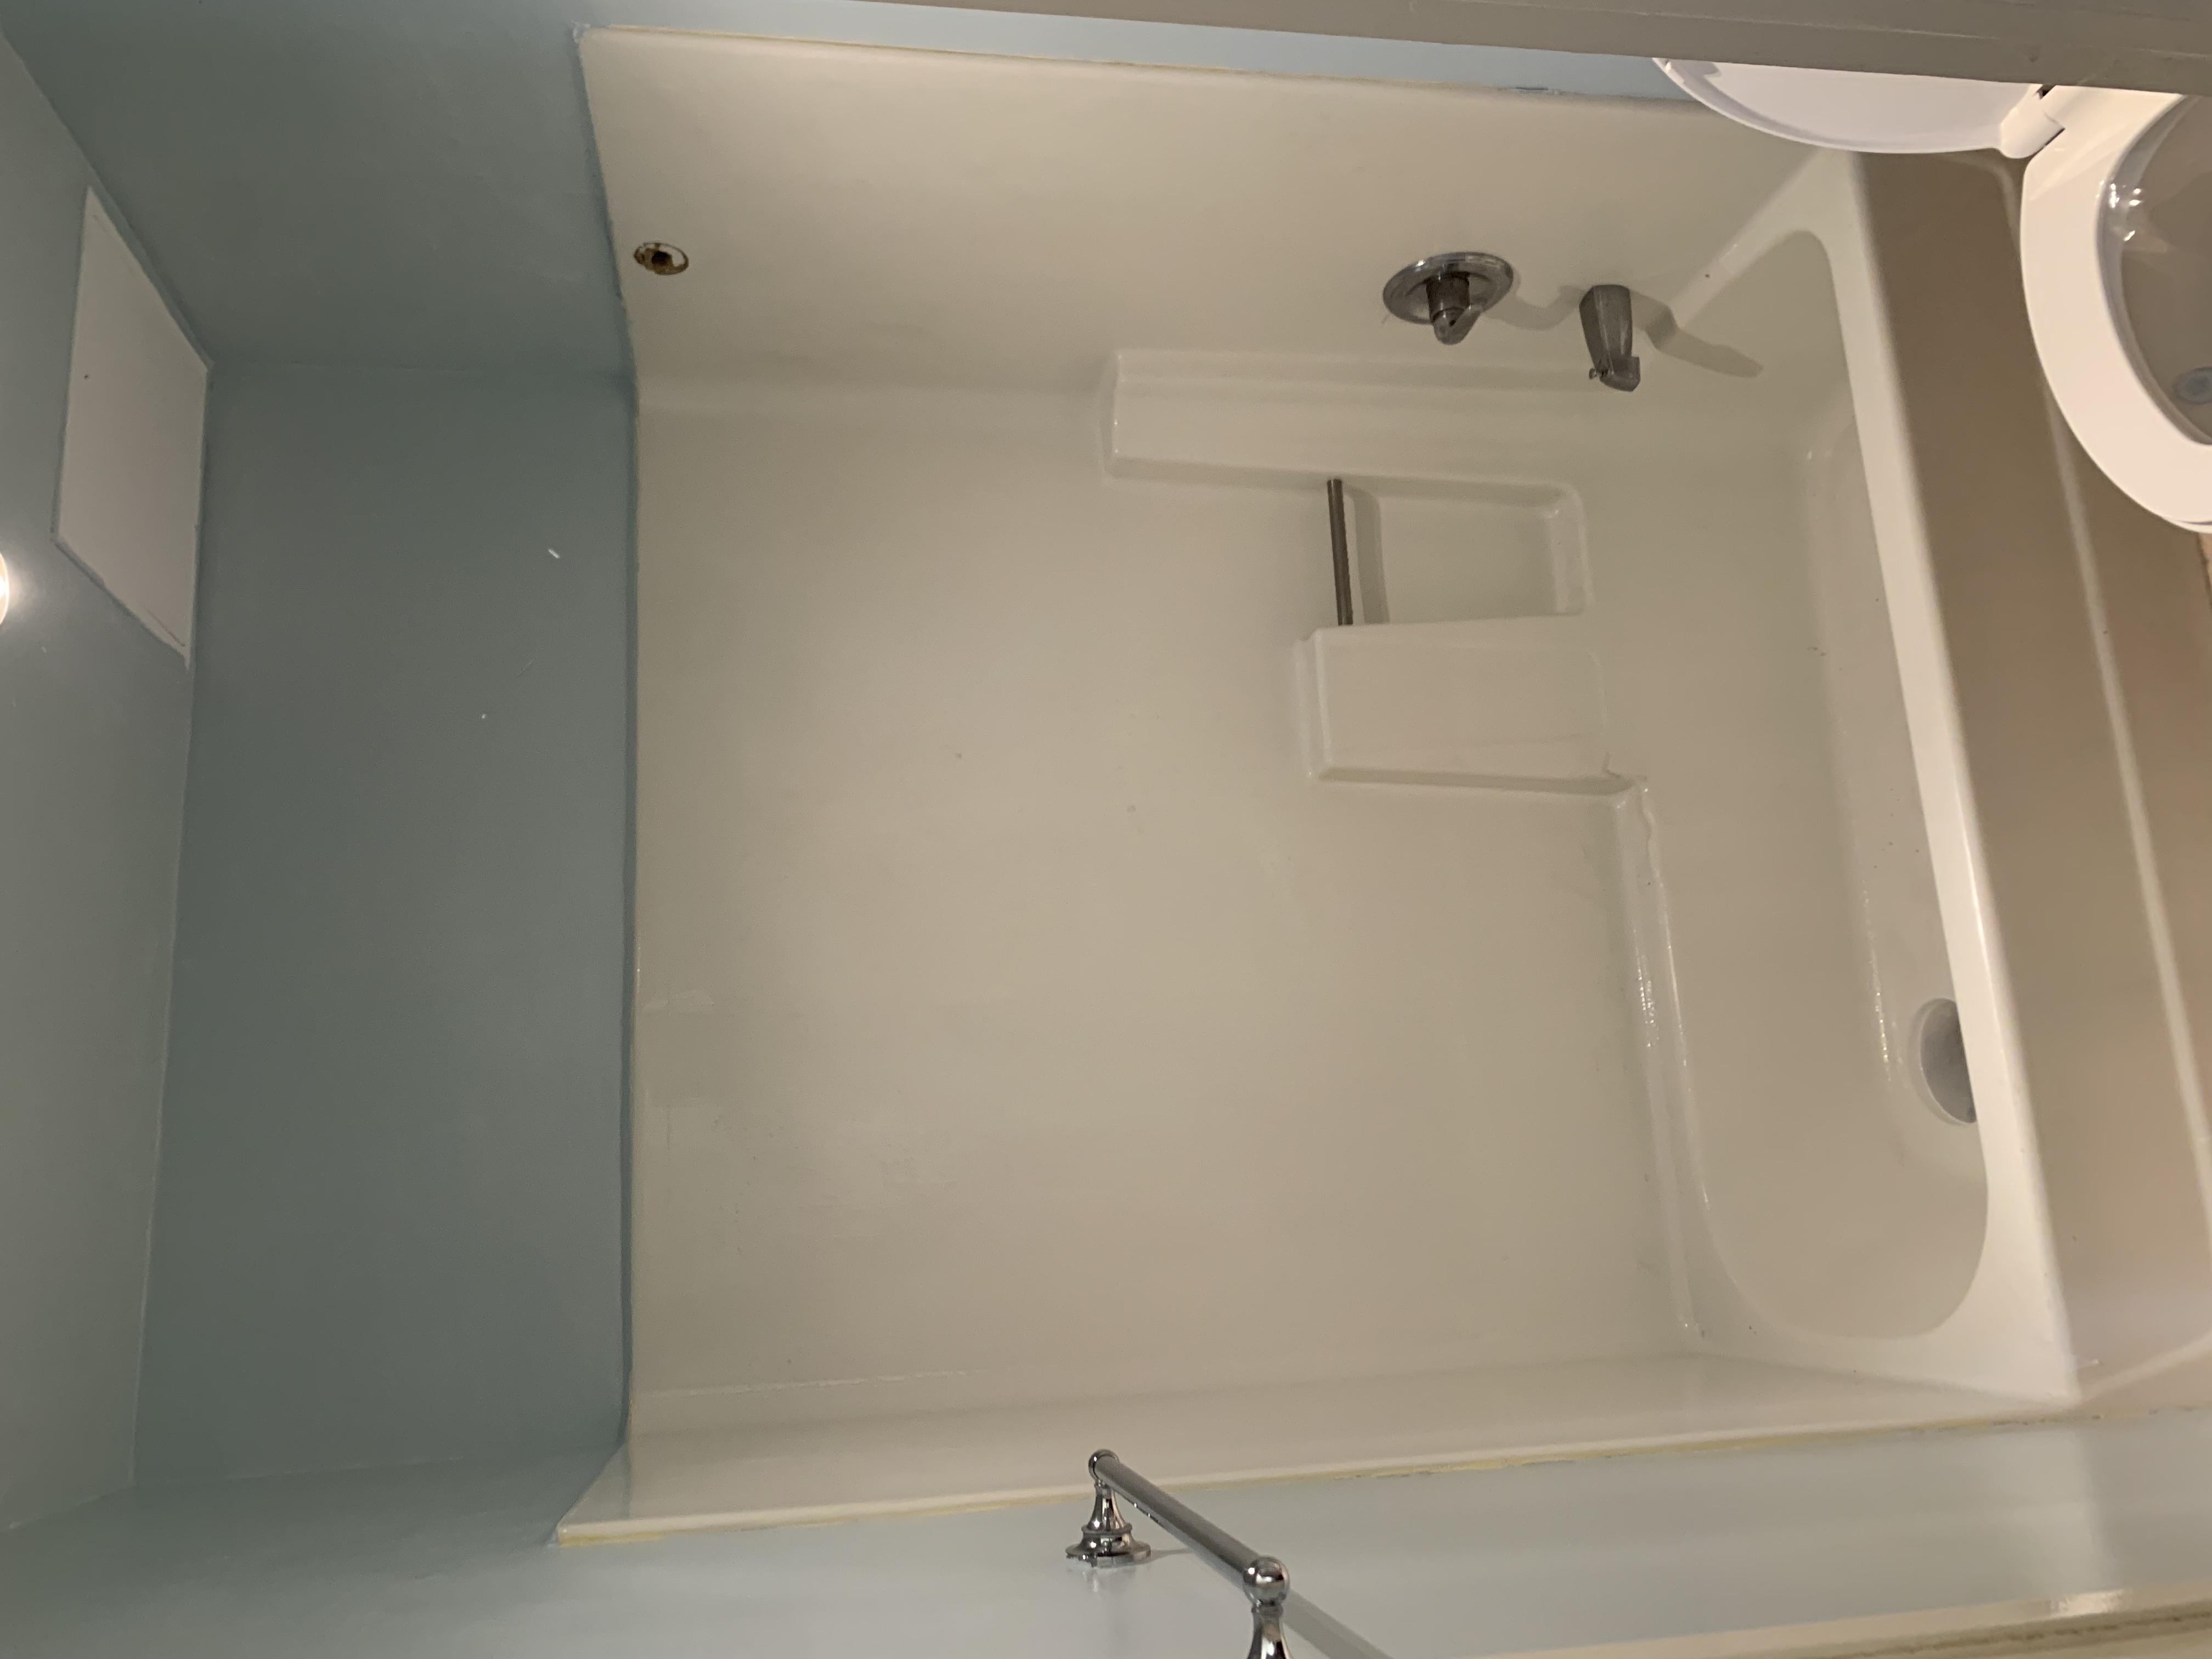 Bathtub Refinishing & Liners Project